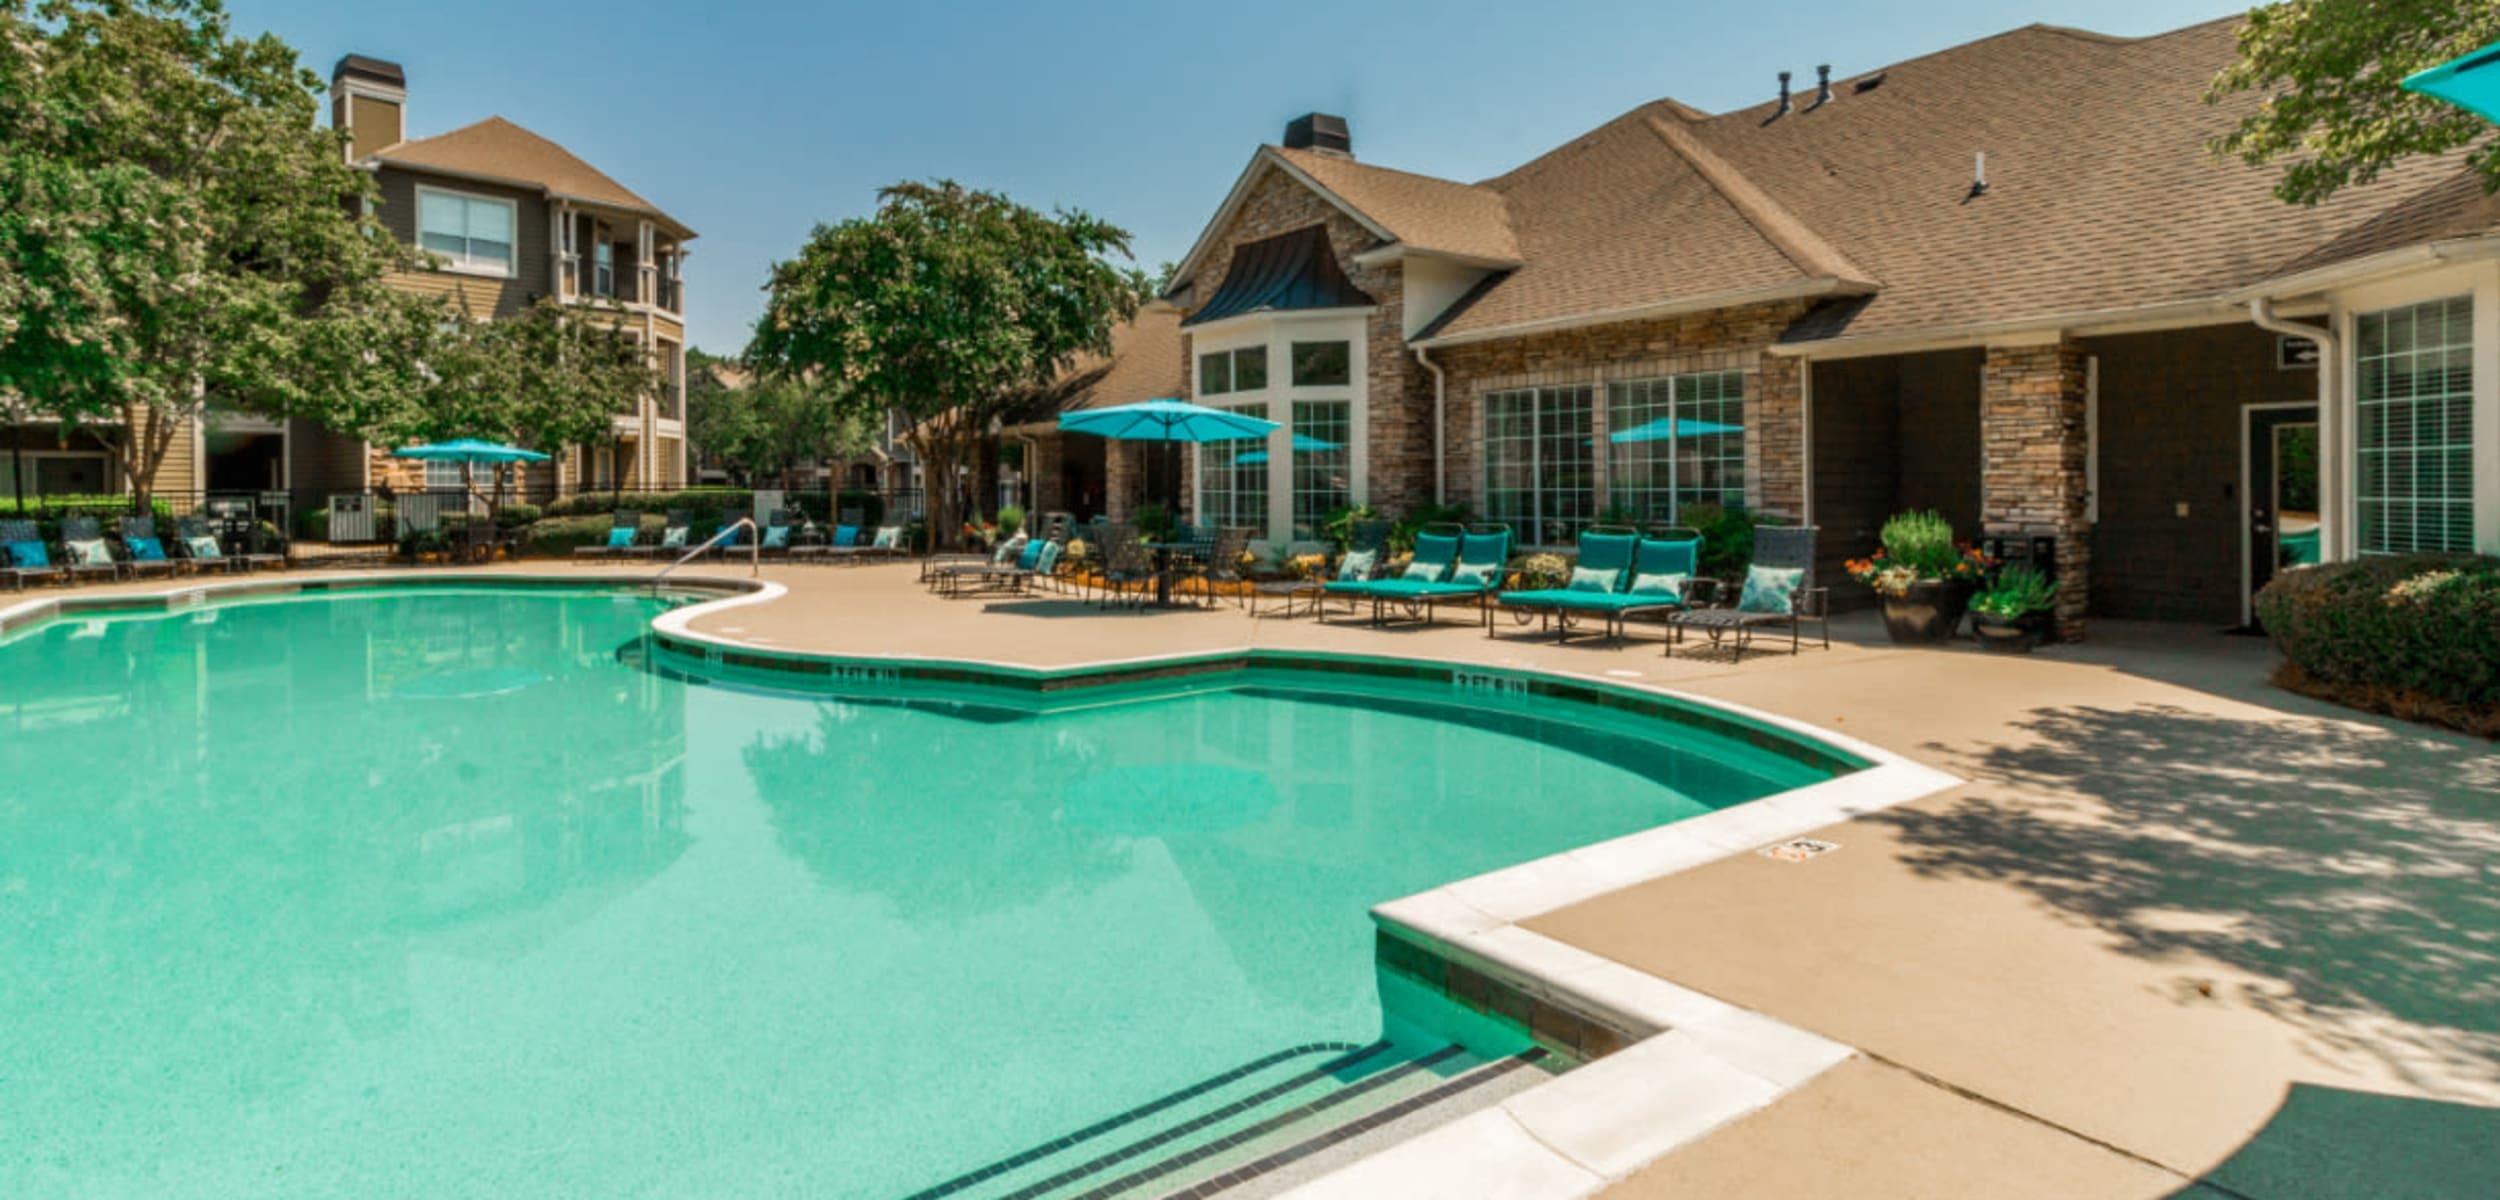 Three foot section of sparkling pool at at Marquis at Carmel Commons in Charlotte North Carolina,